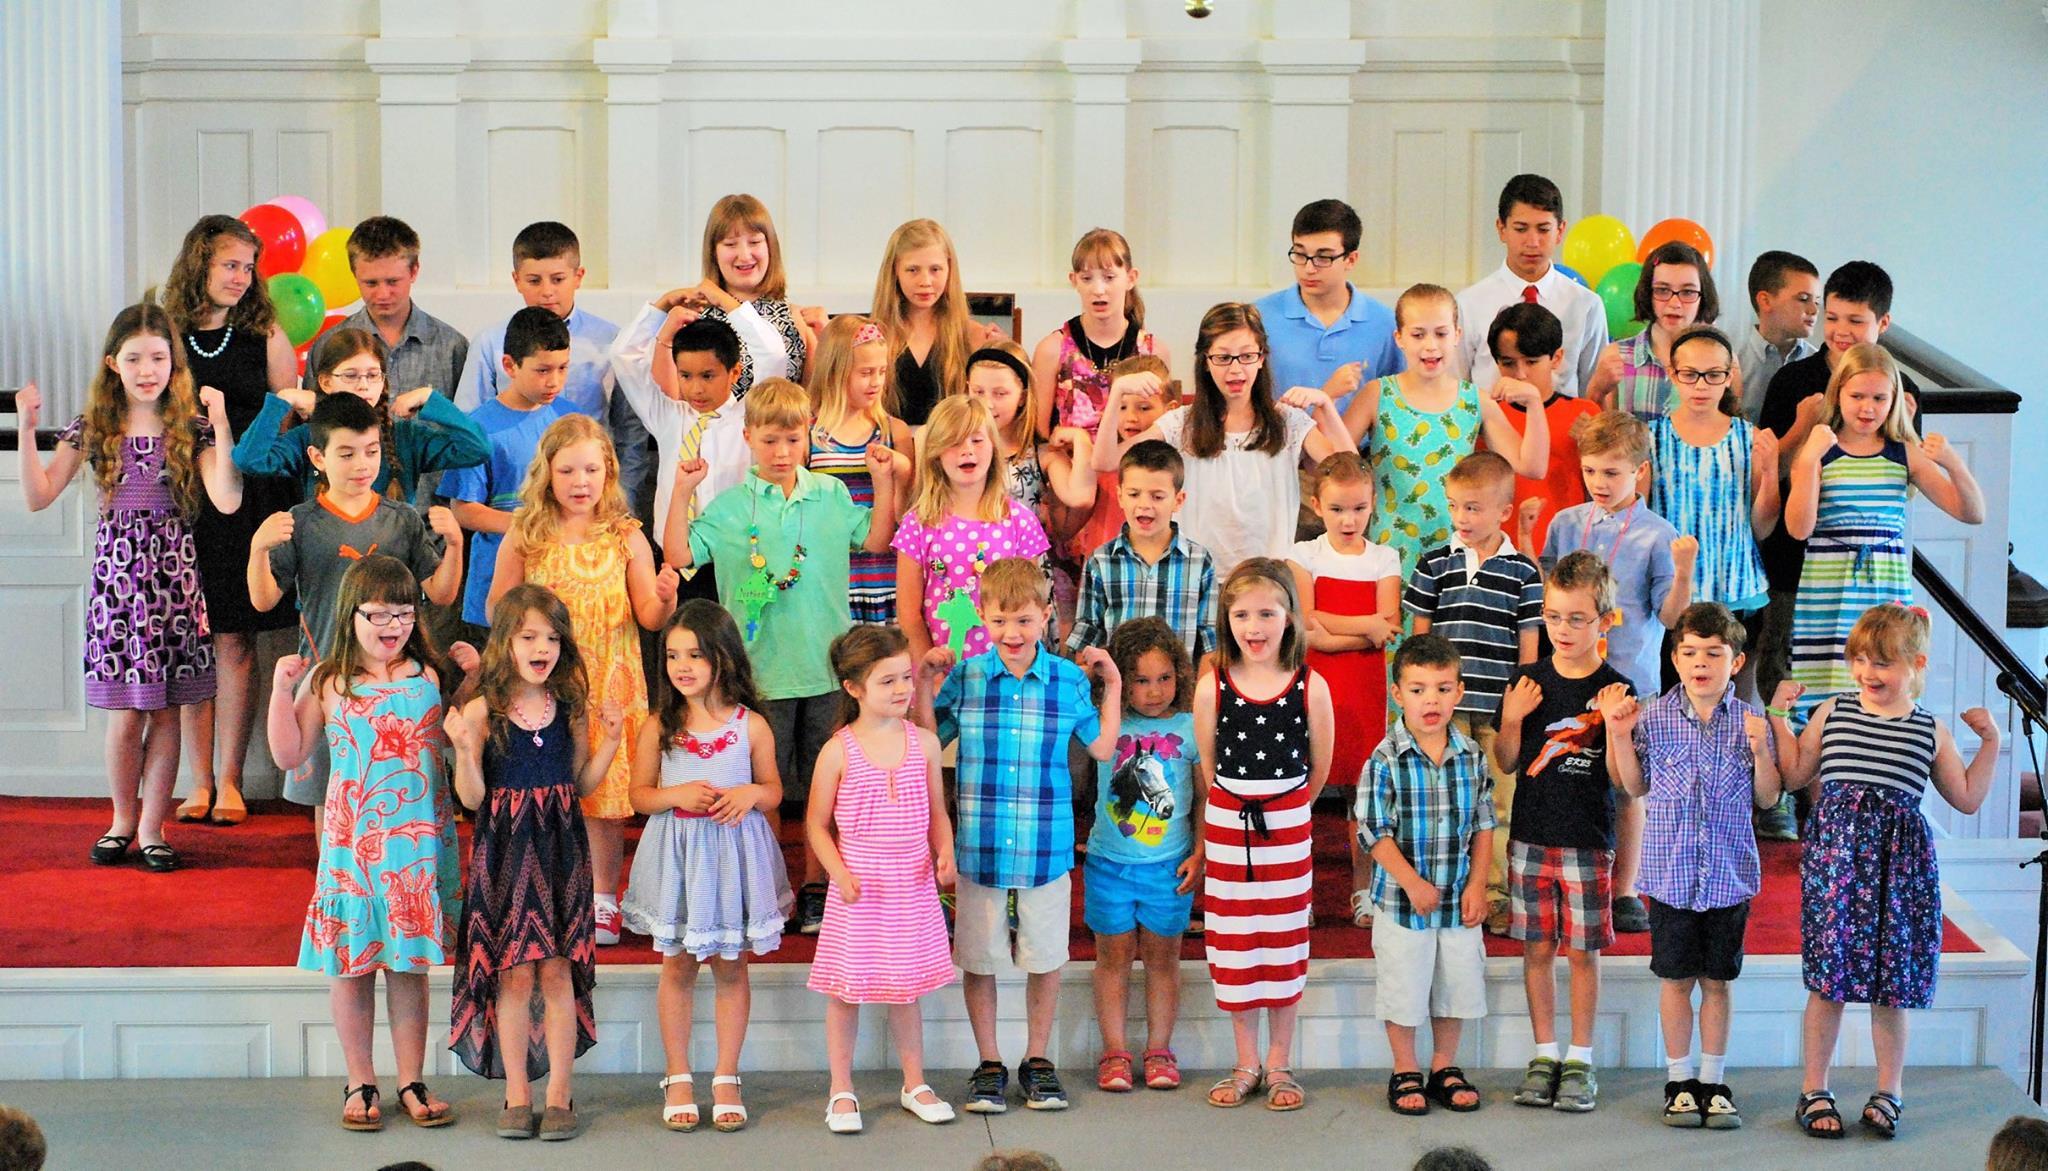 Childrens Celebration